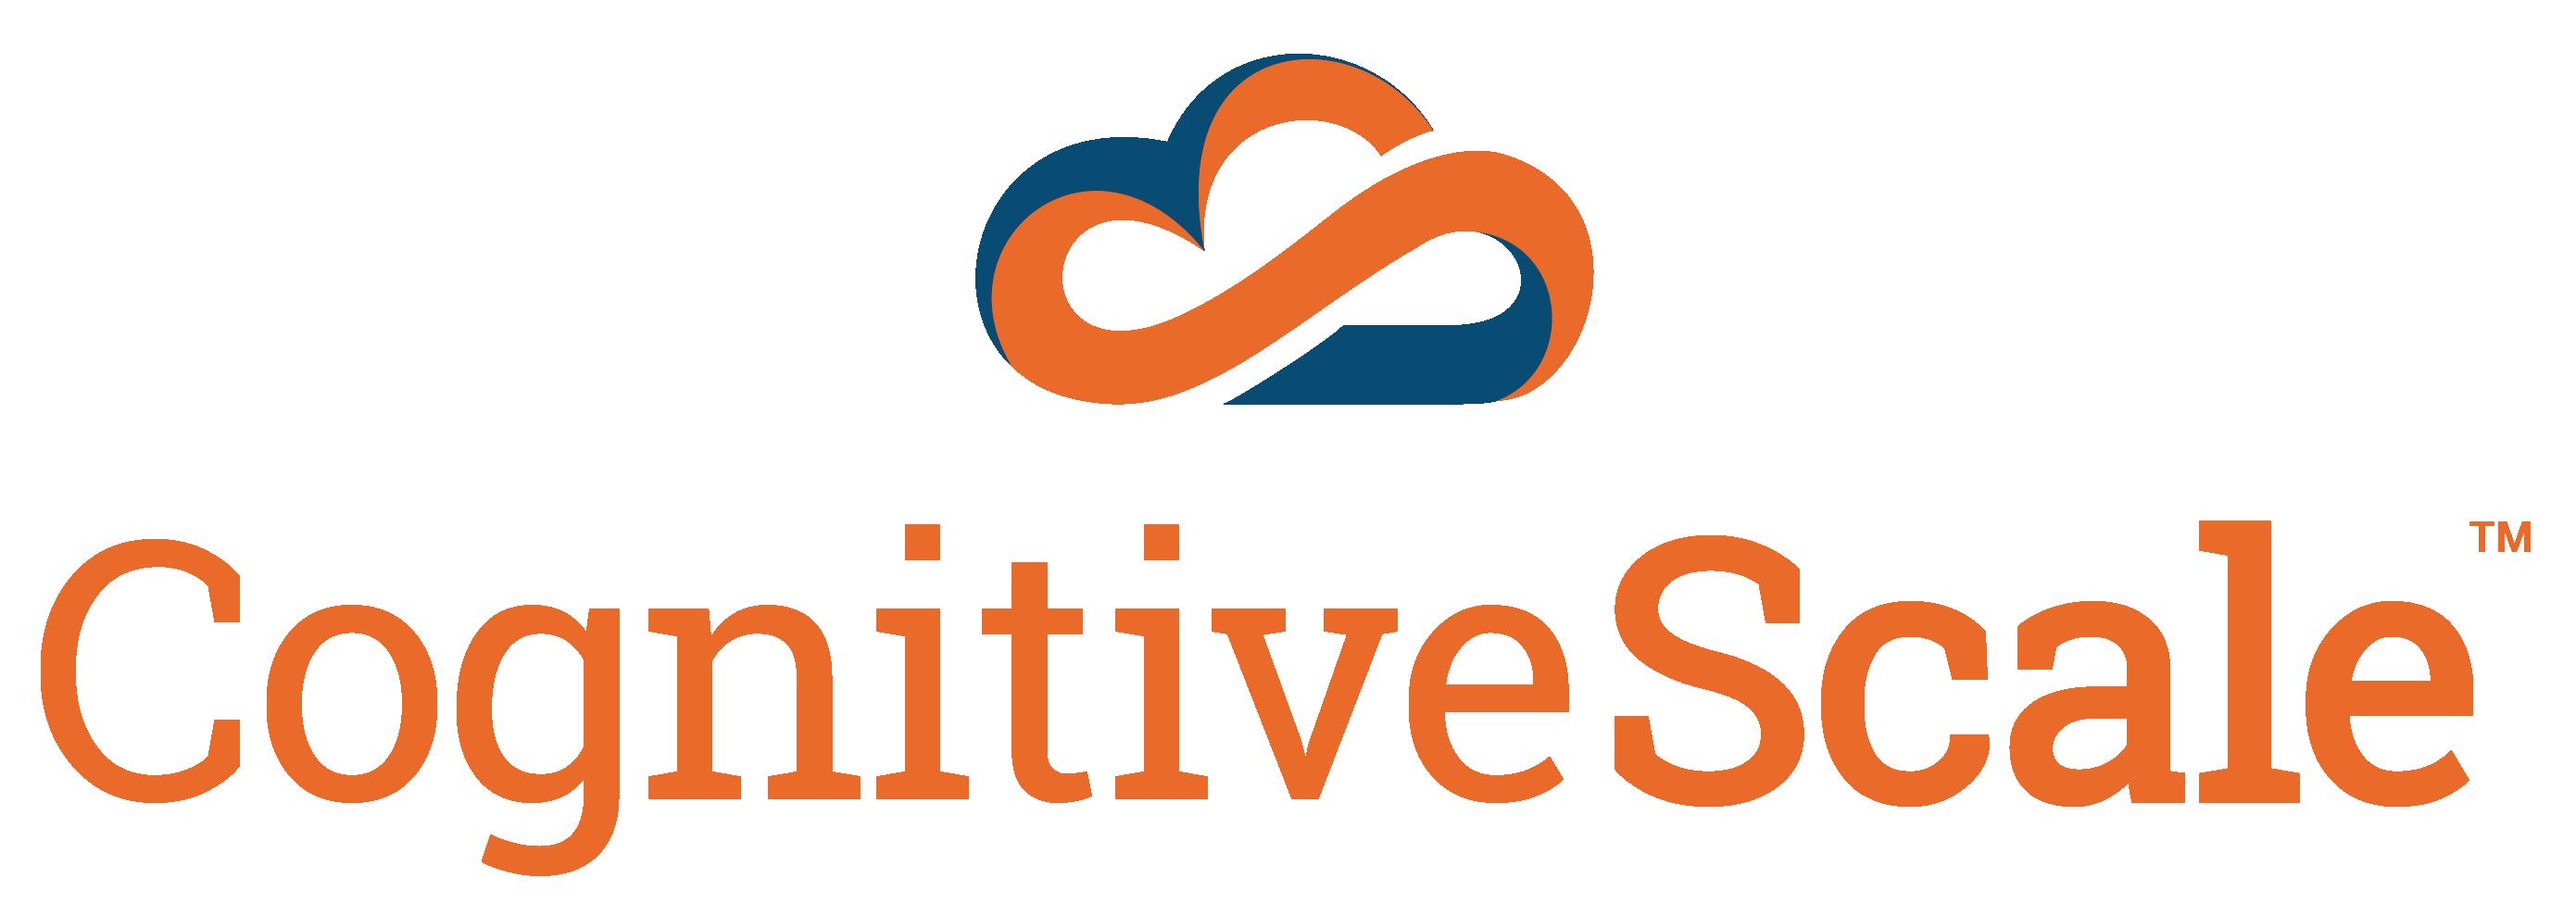 CognitiveScale company logo